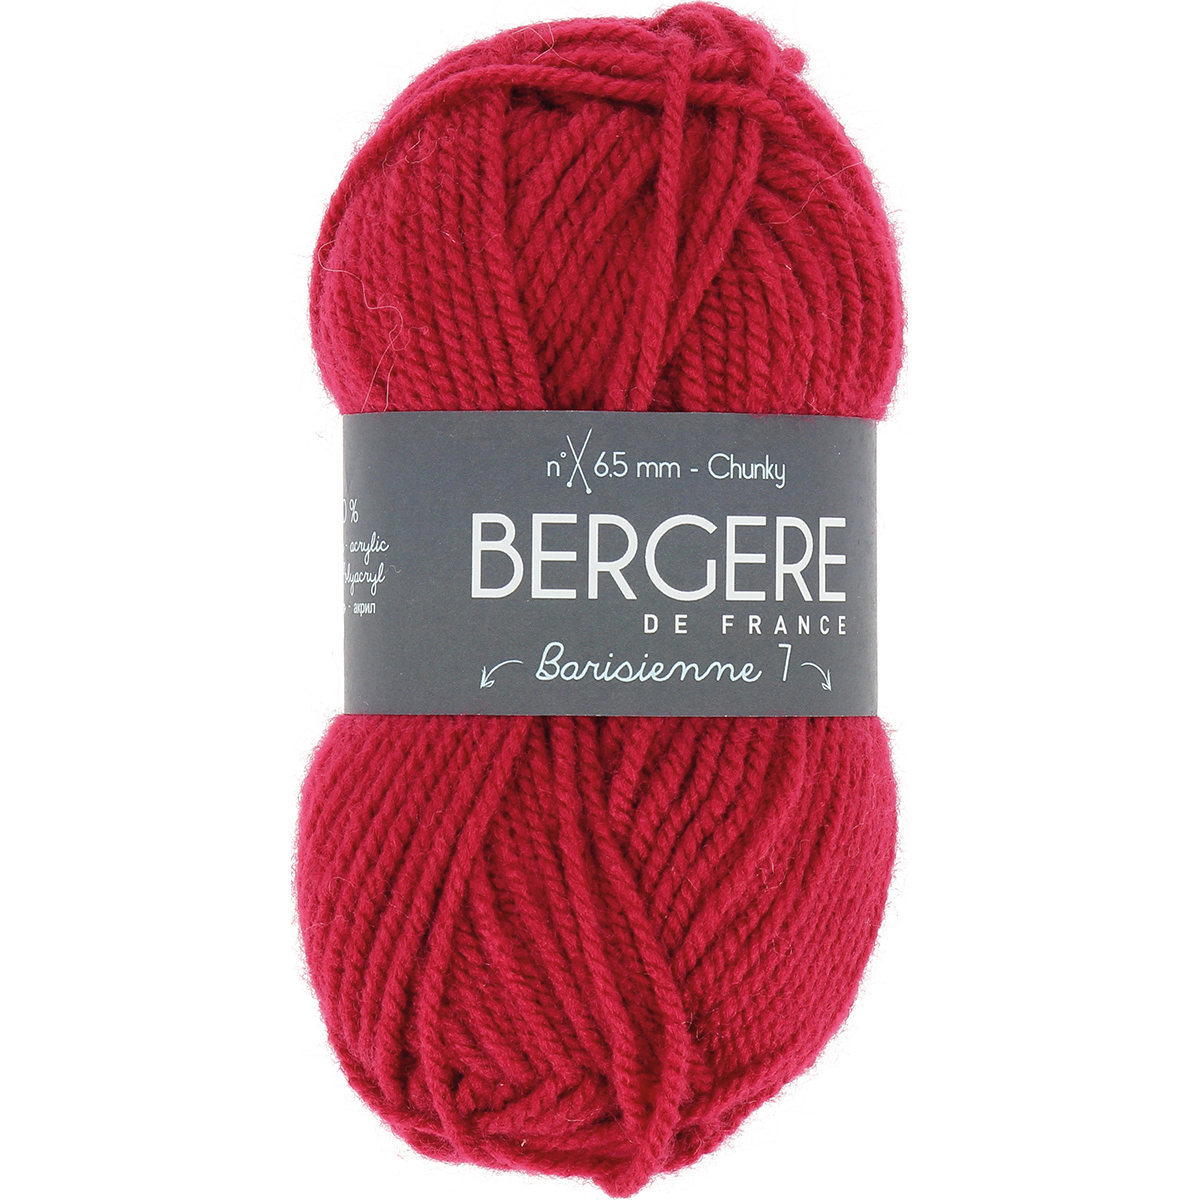 Bergere De France BARISIE7-10218 Coulis - Barisienne 7 Yarn